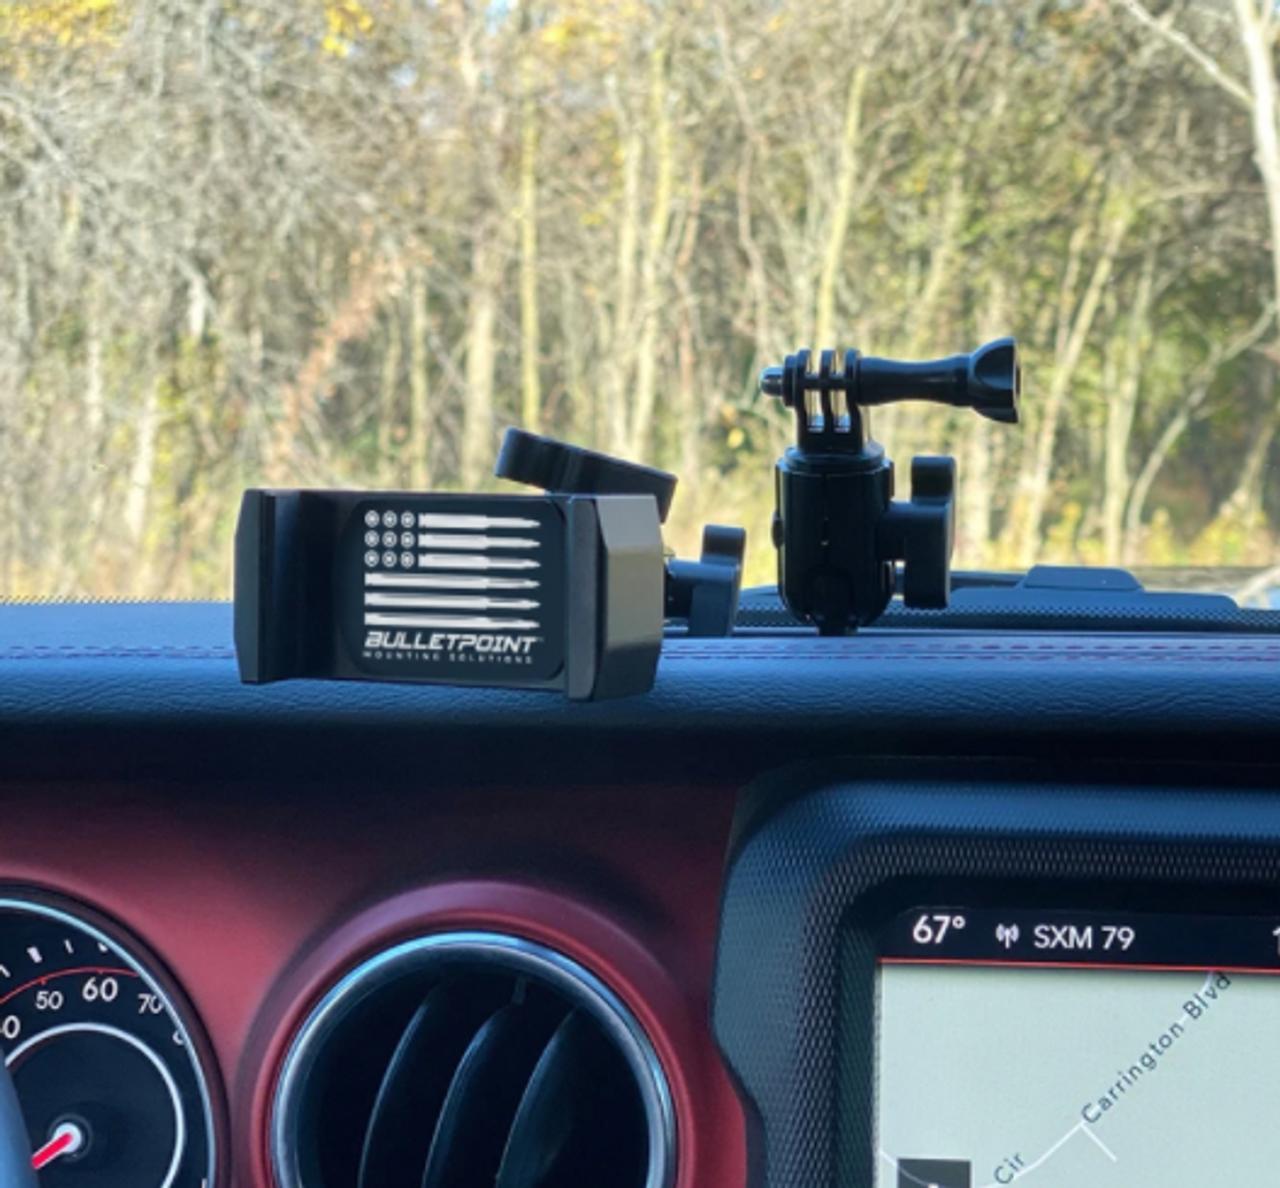 Bulletpoint Mounting Solutions MSUDDPM-JLJT Metal Series Dual Dash Phone Mount for Jeep Wrangler JL & Gladiator JT 2018+